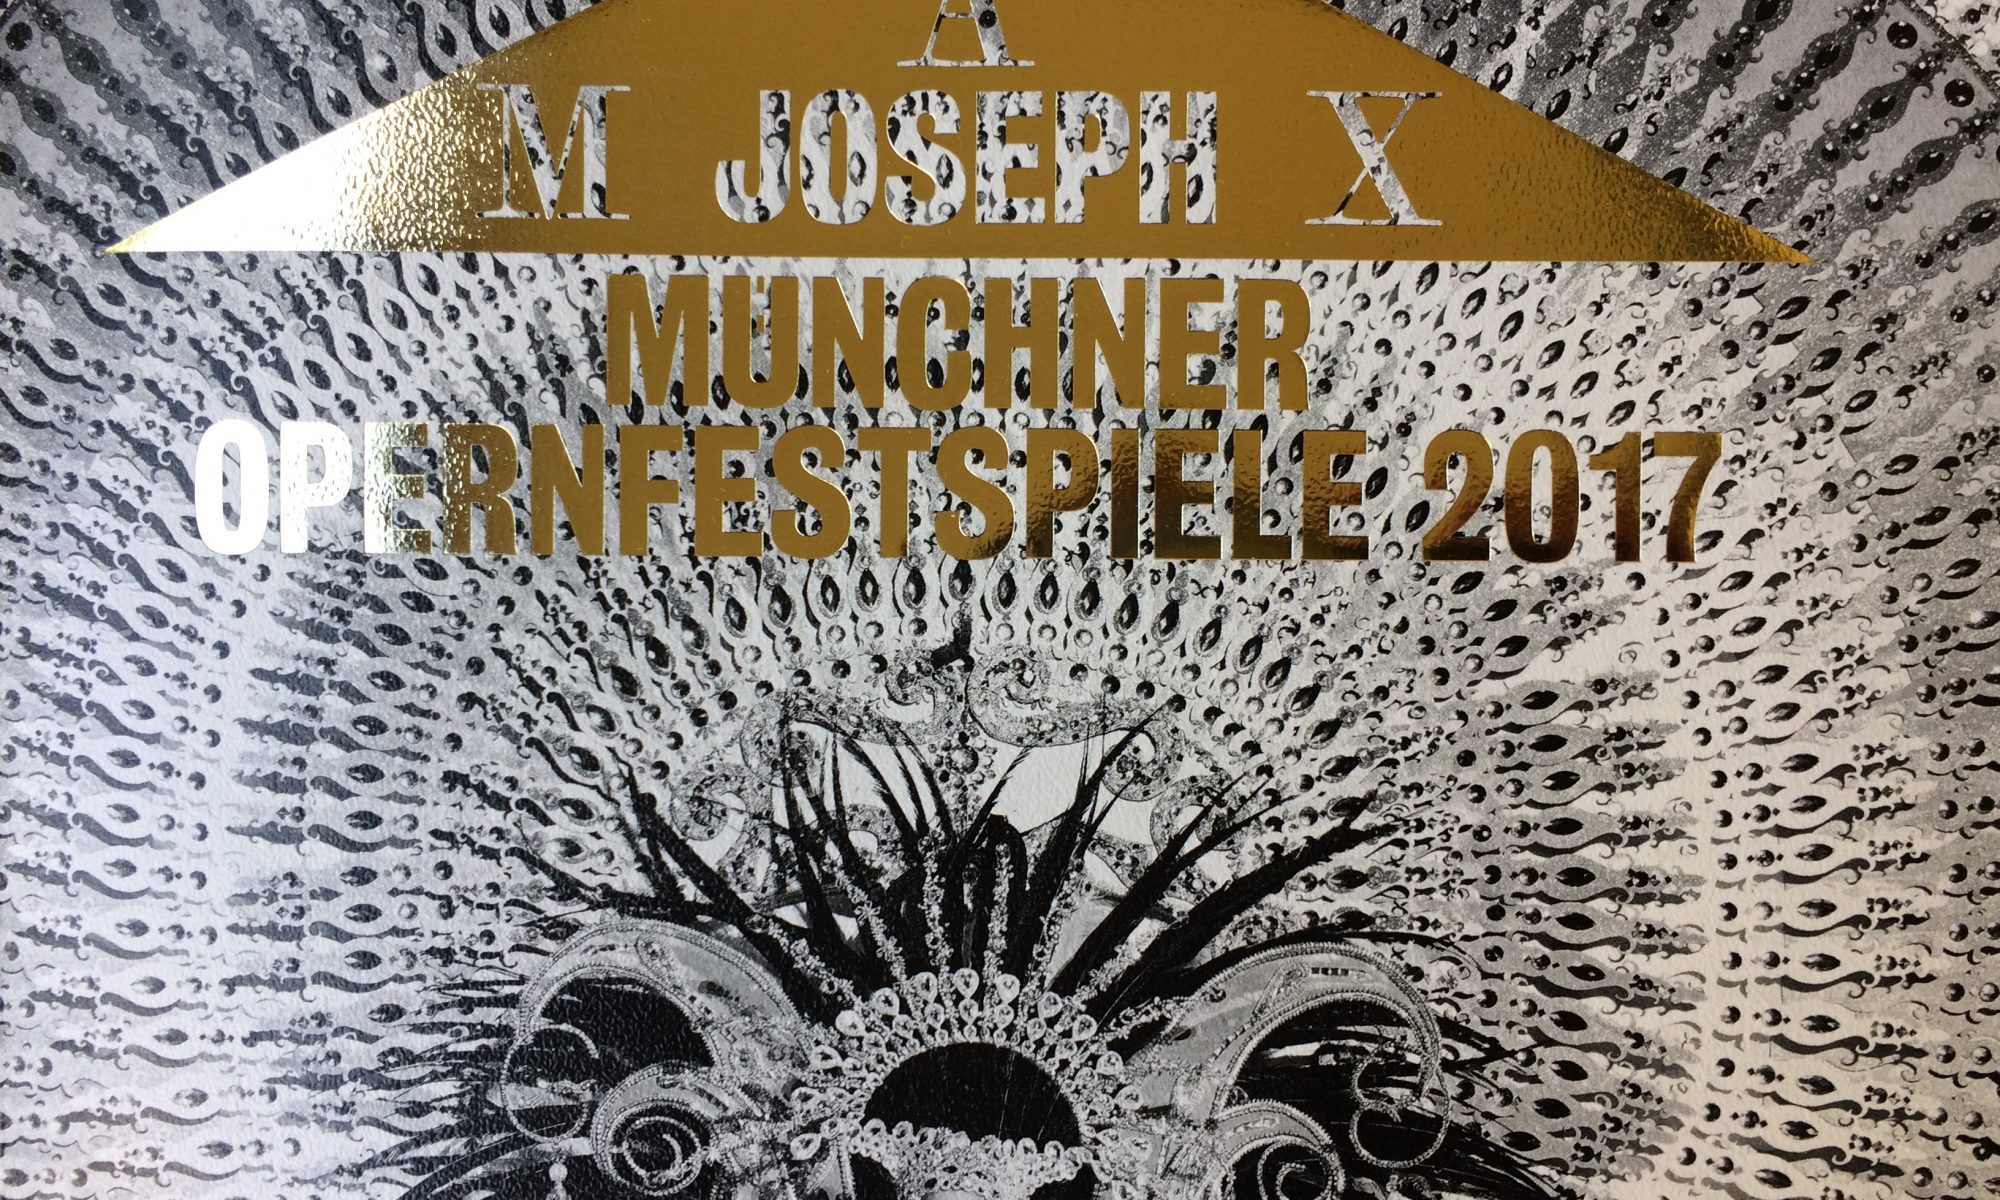 Max Joseph - Opernfestspiele